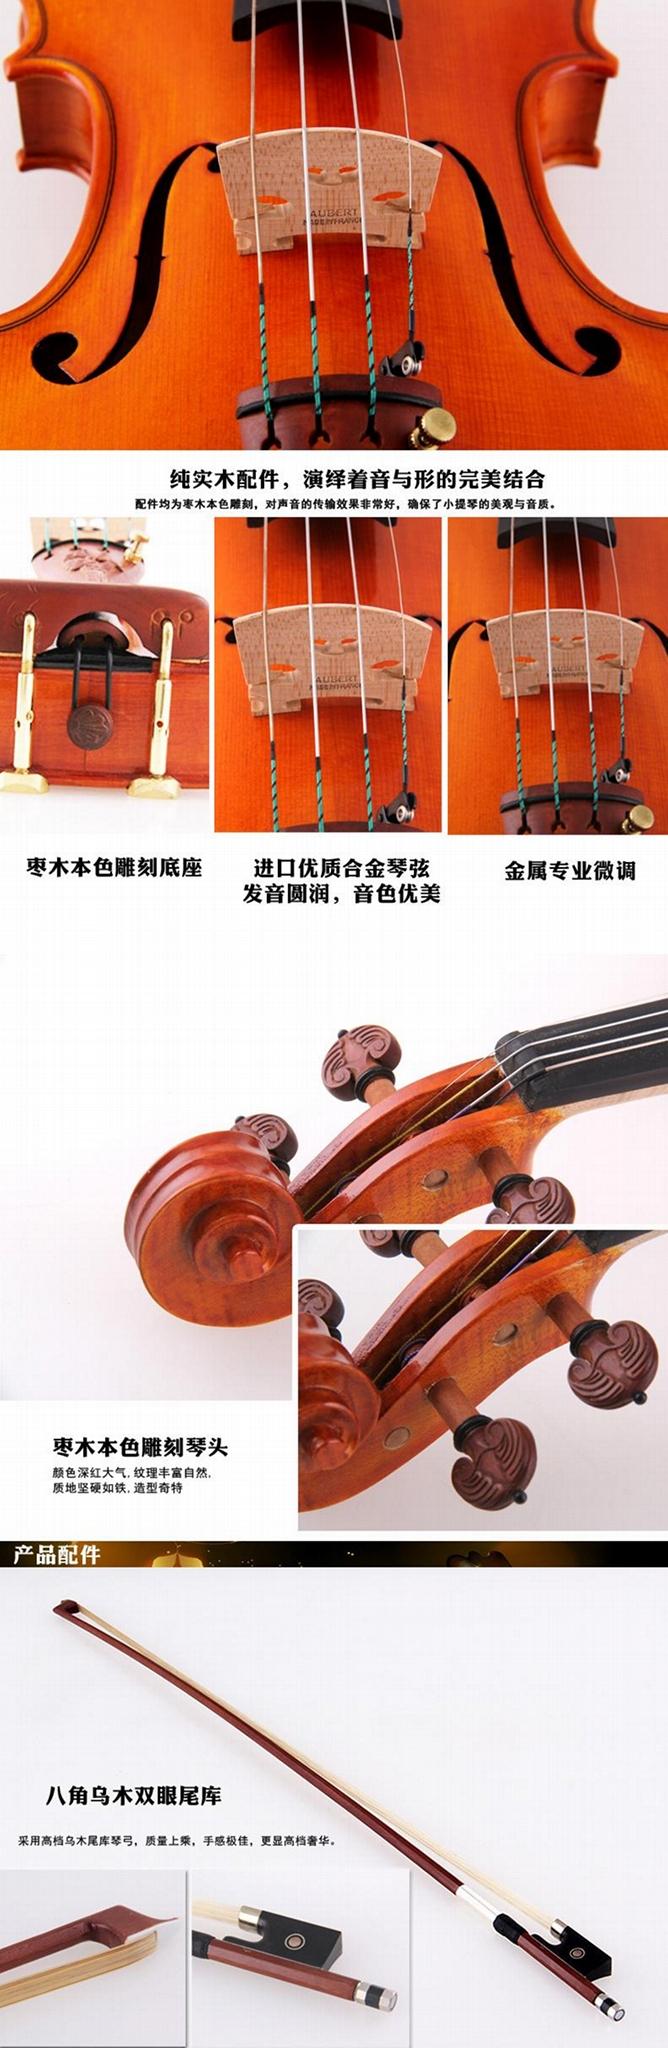 JYVL-S198 Professional handcraft high grade solo violin Factory 13